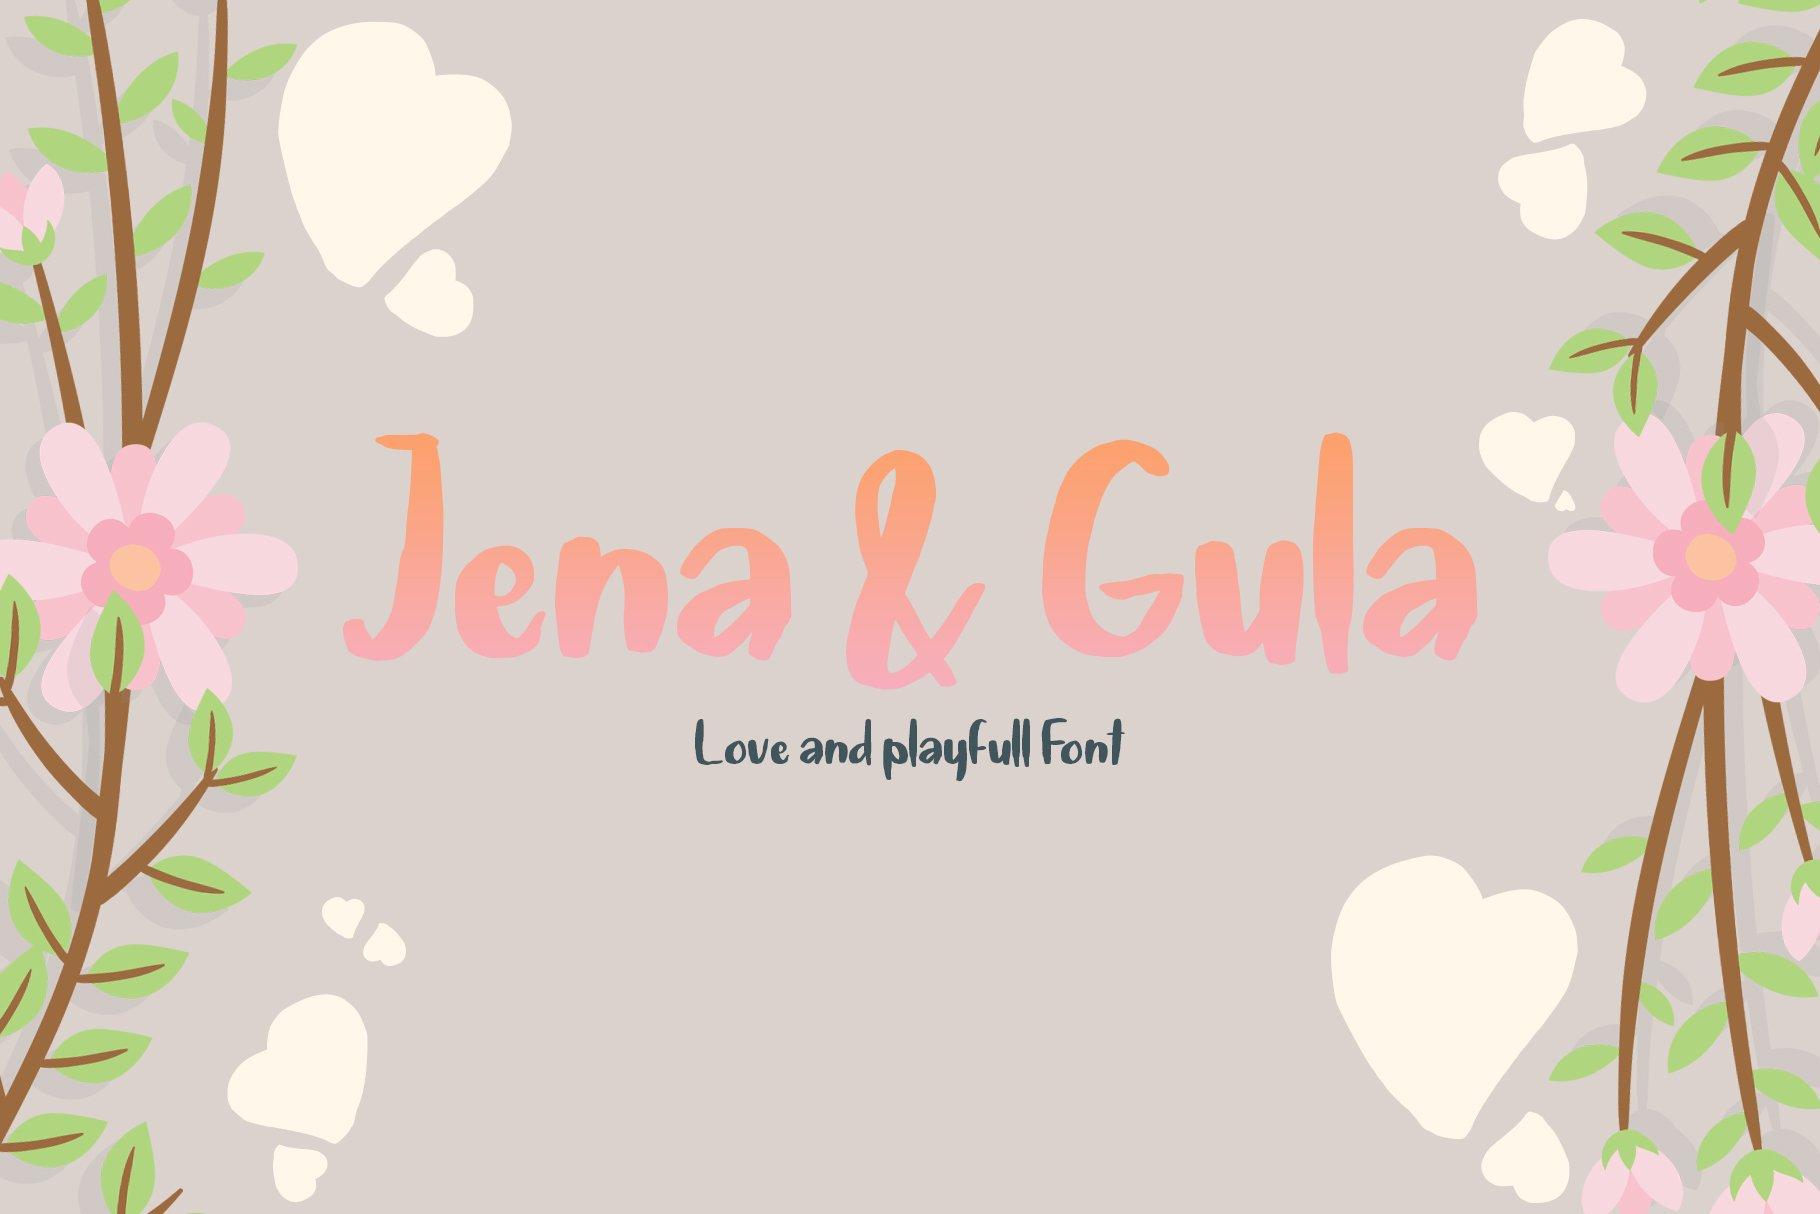 Jena & Gula | Love and Playfull Font example image 1